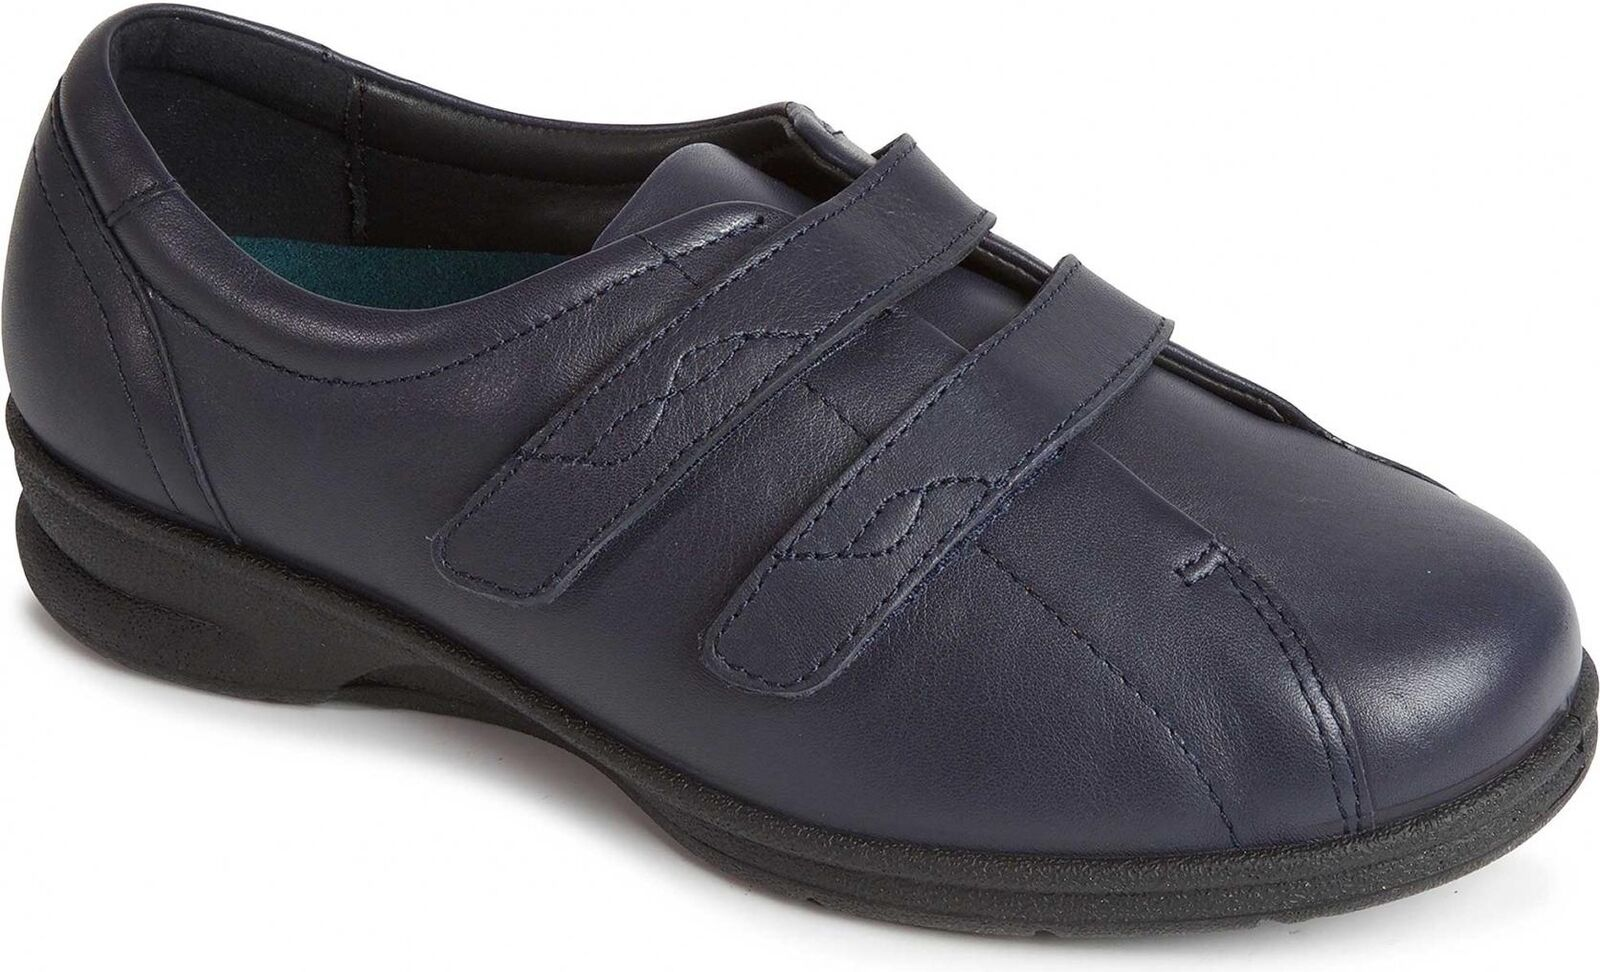 Rohde Avigliana Pantofole Zoccoli Donna Pantofole Pantofole Avigliana 6173 Hunter Green 52dd8d